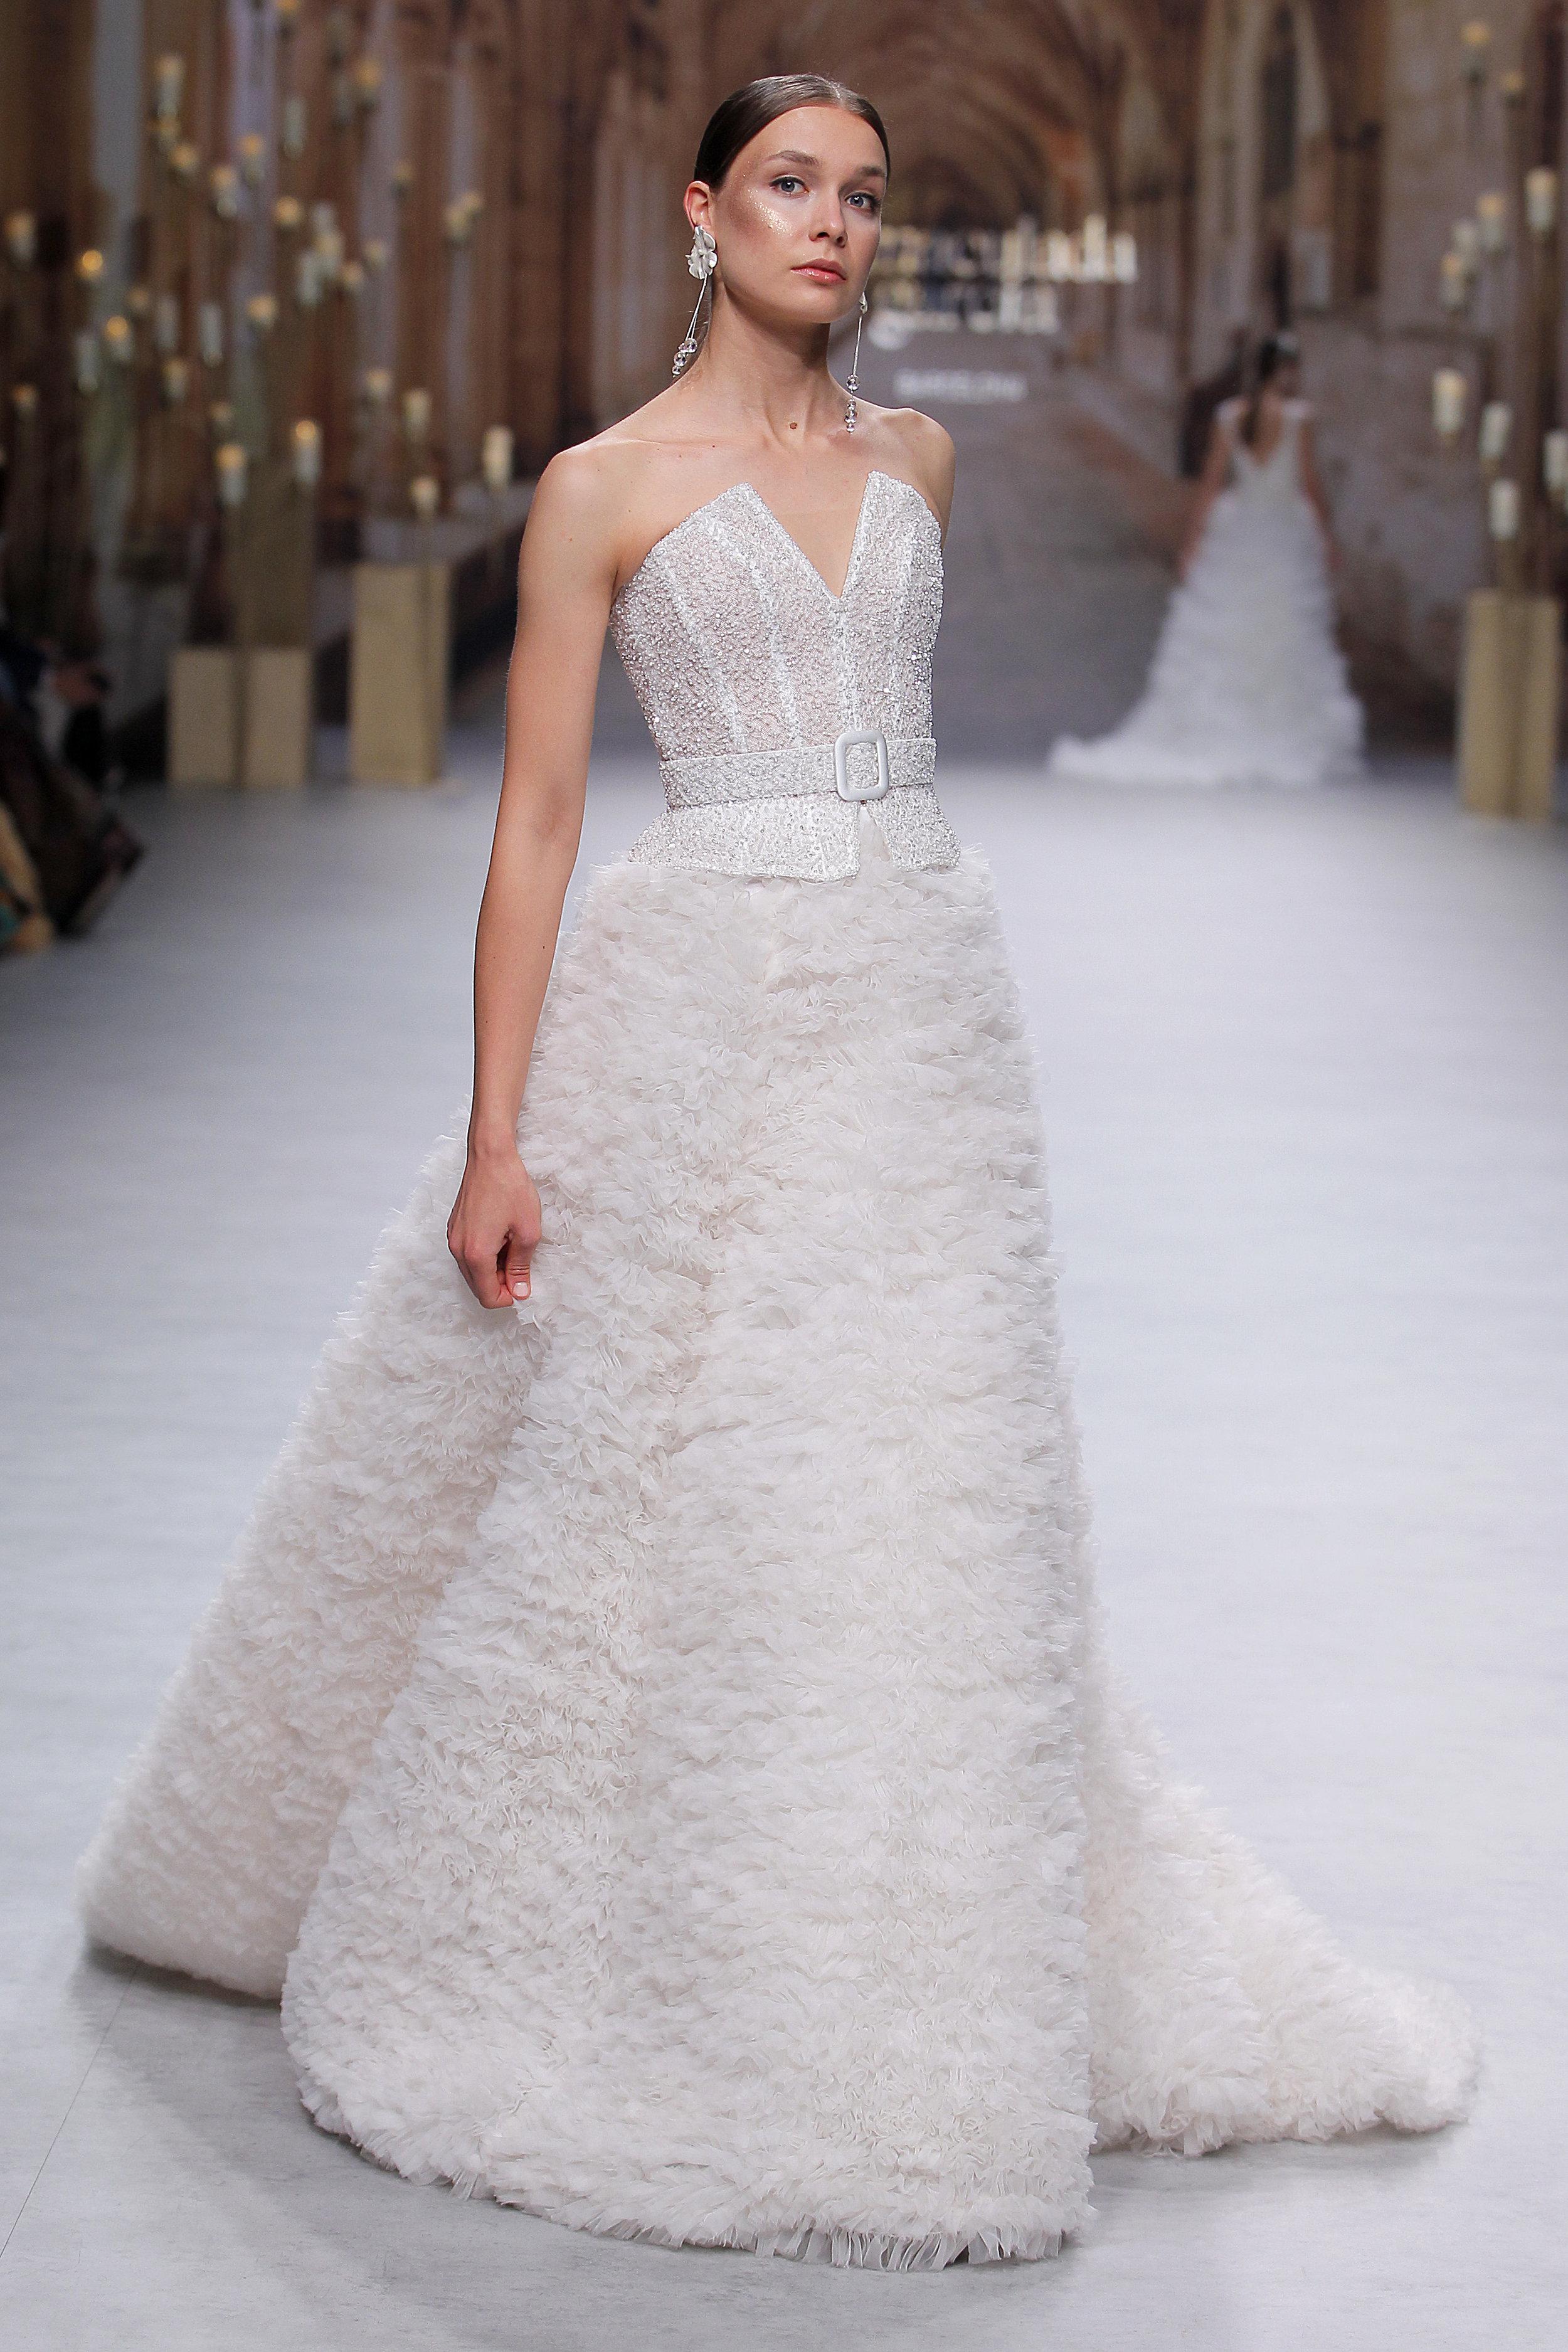 Vestido: Inmaculada García / Pasarela:  Valmont Barcelona Bridal Fashion Week